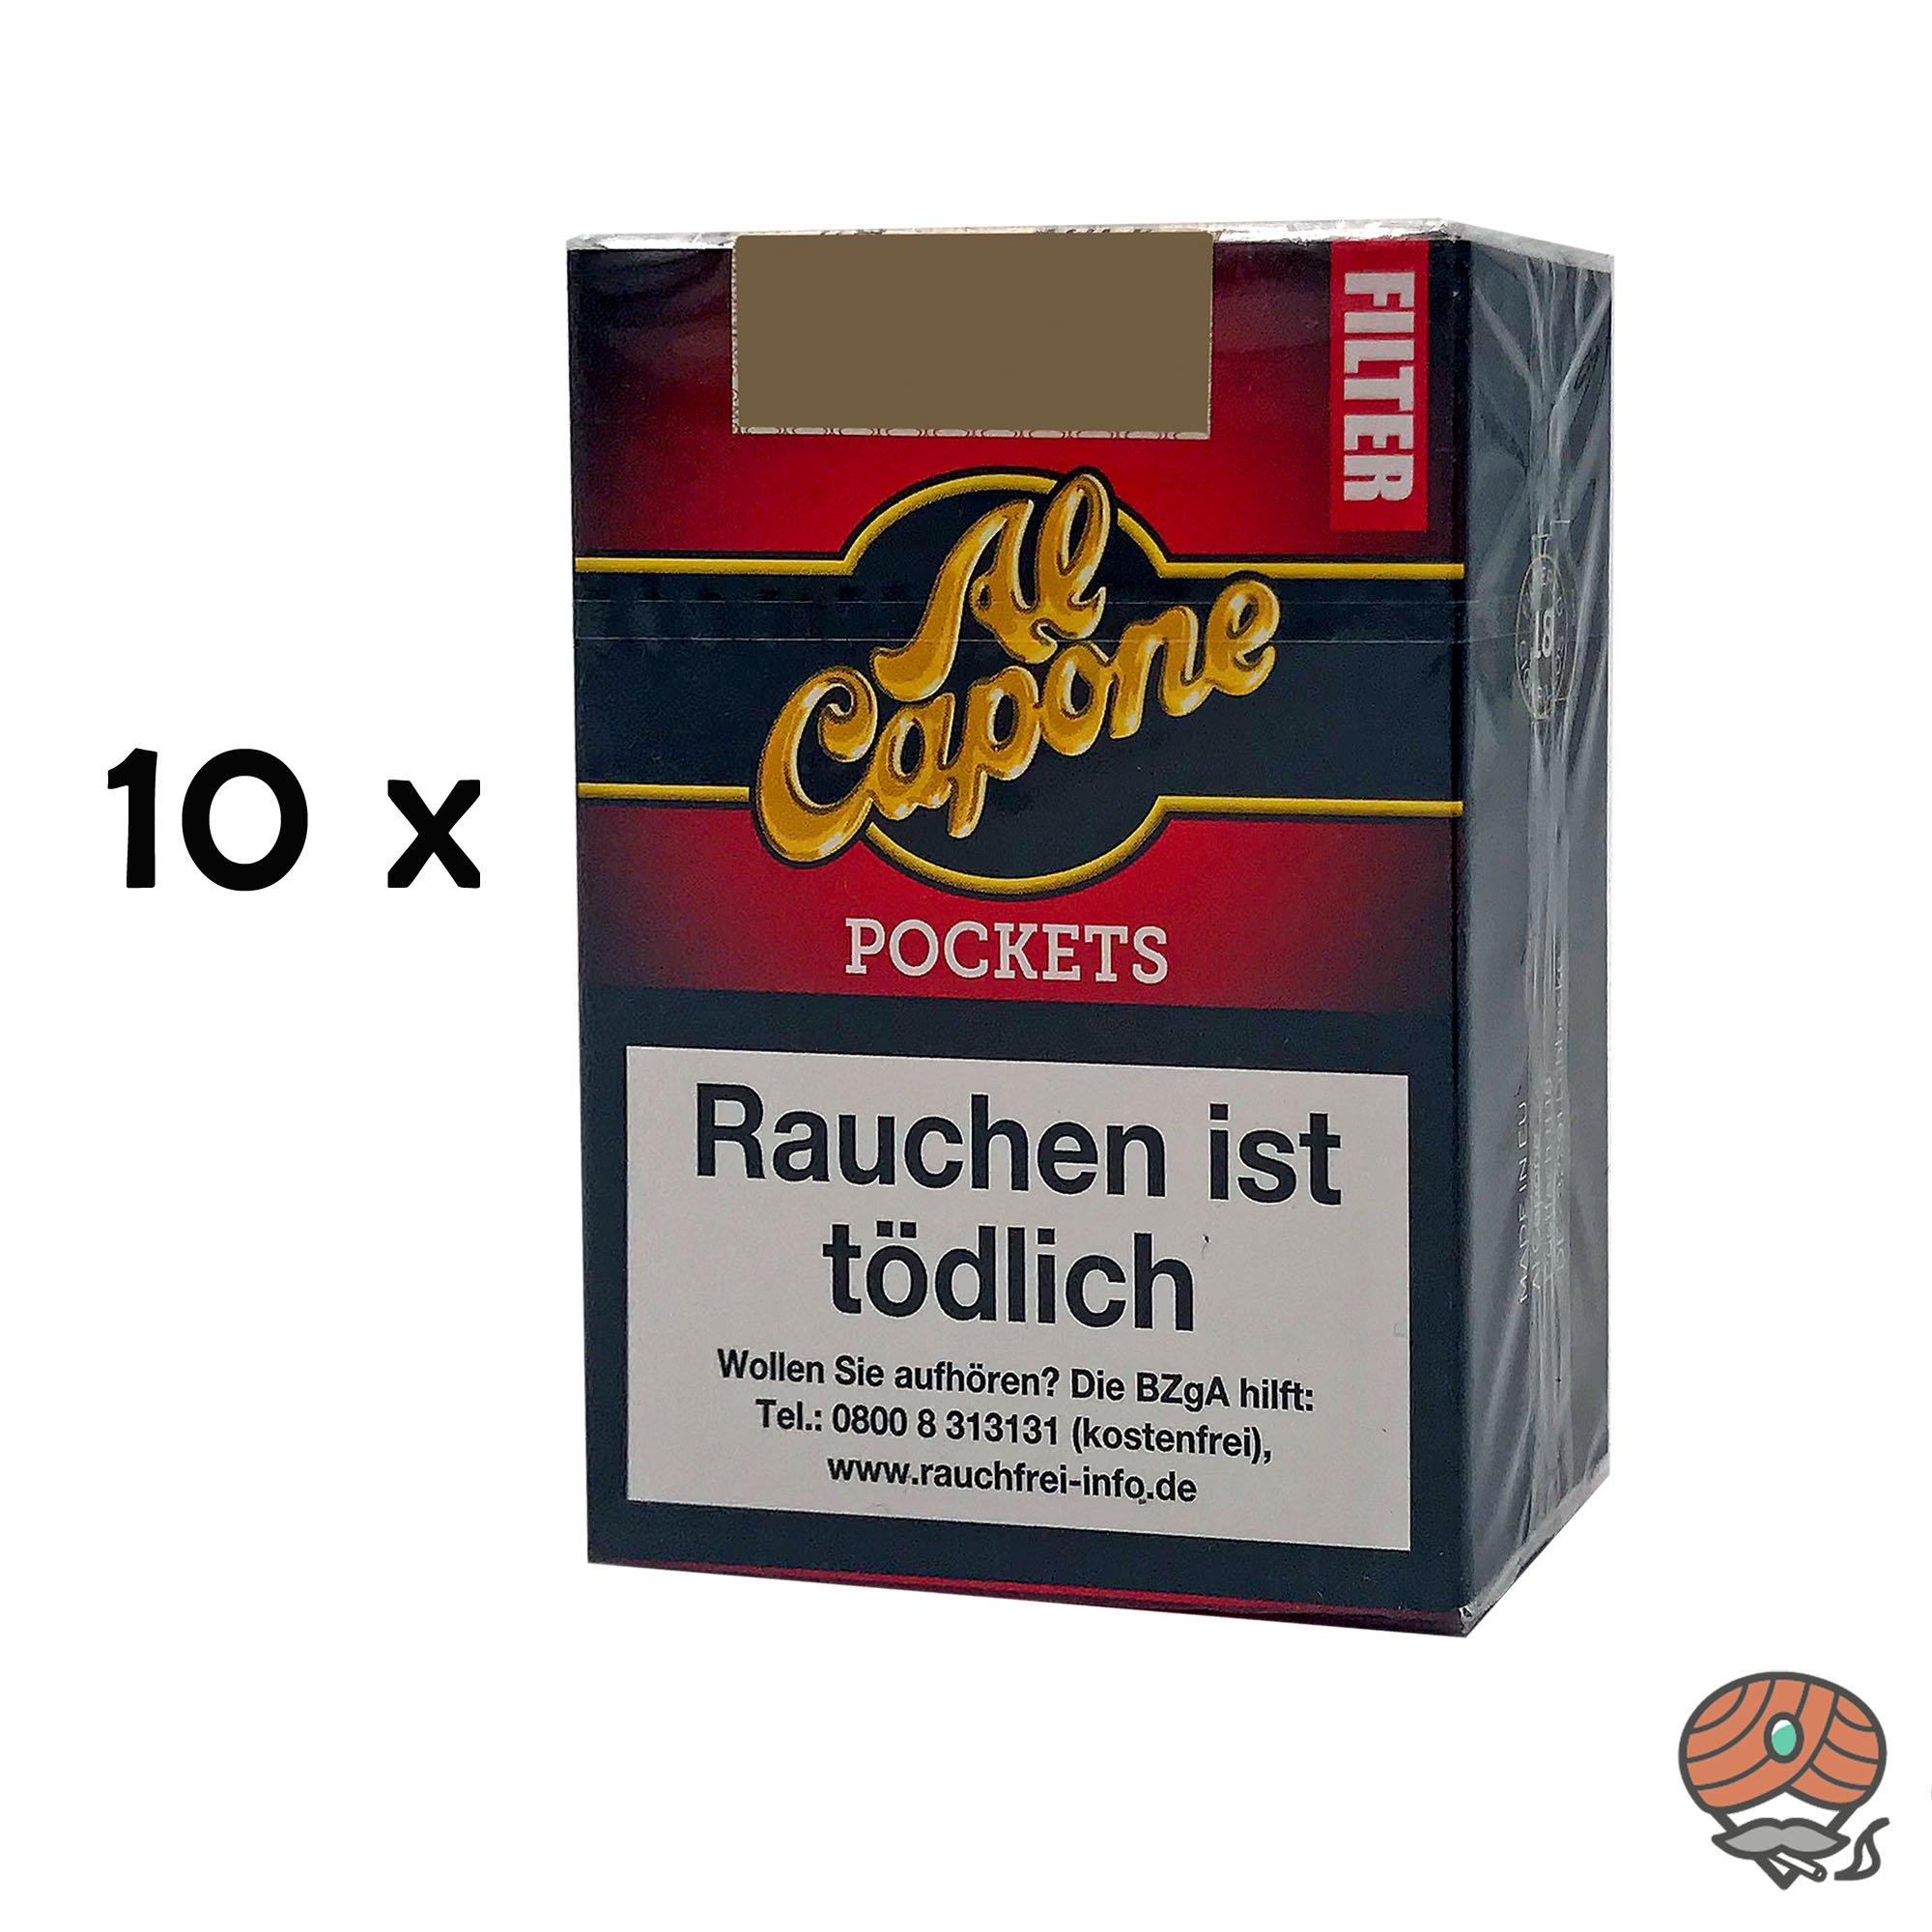 10 x Al Capone Pockets Red Blend Filterzigarillos